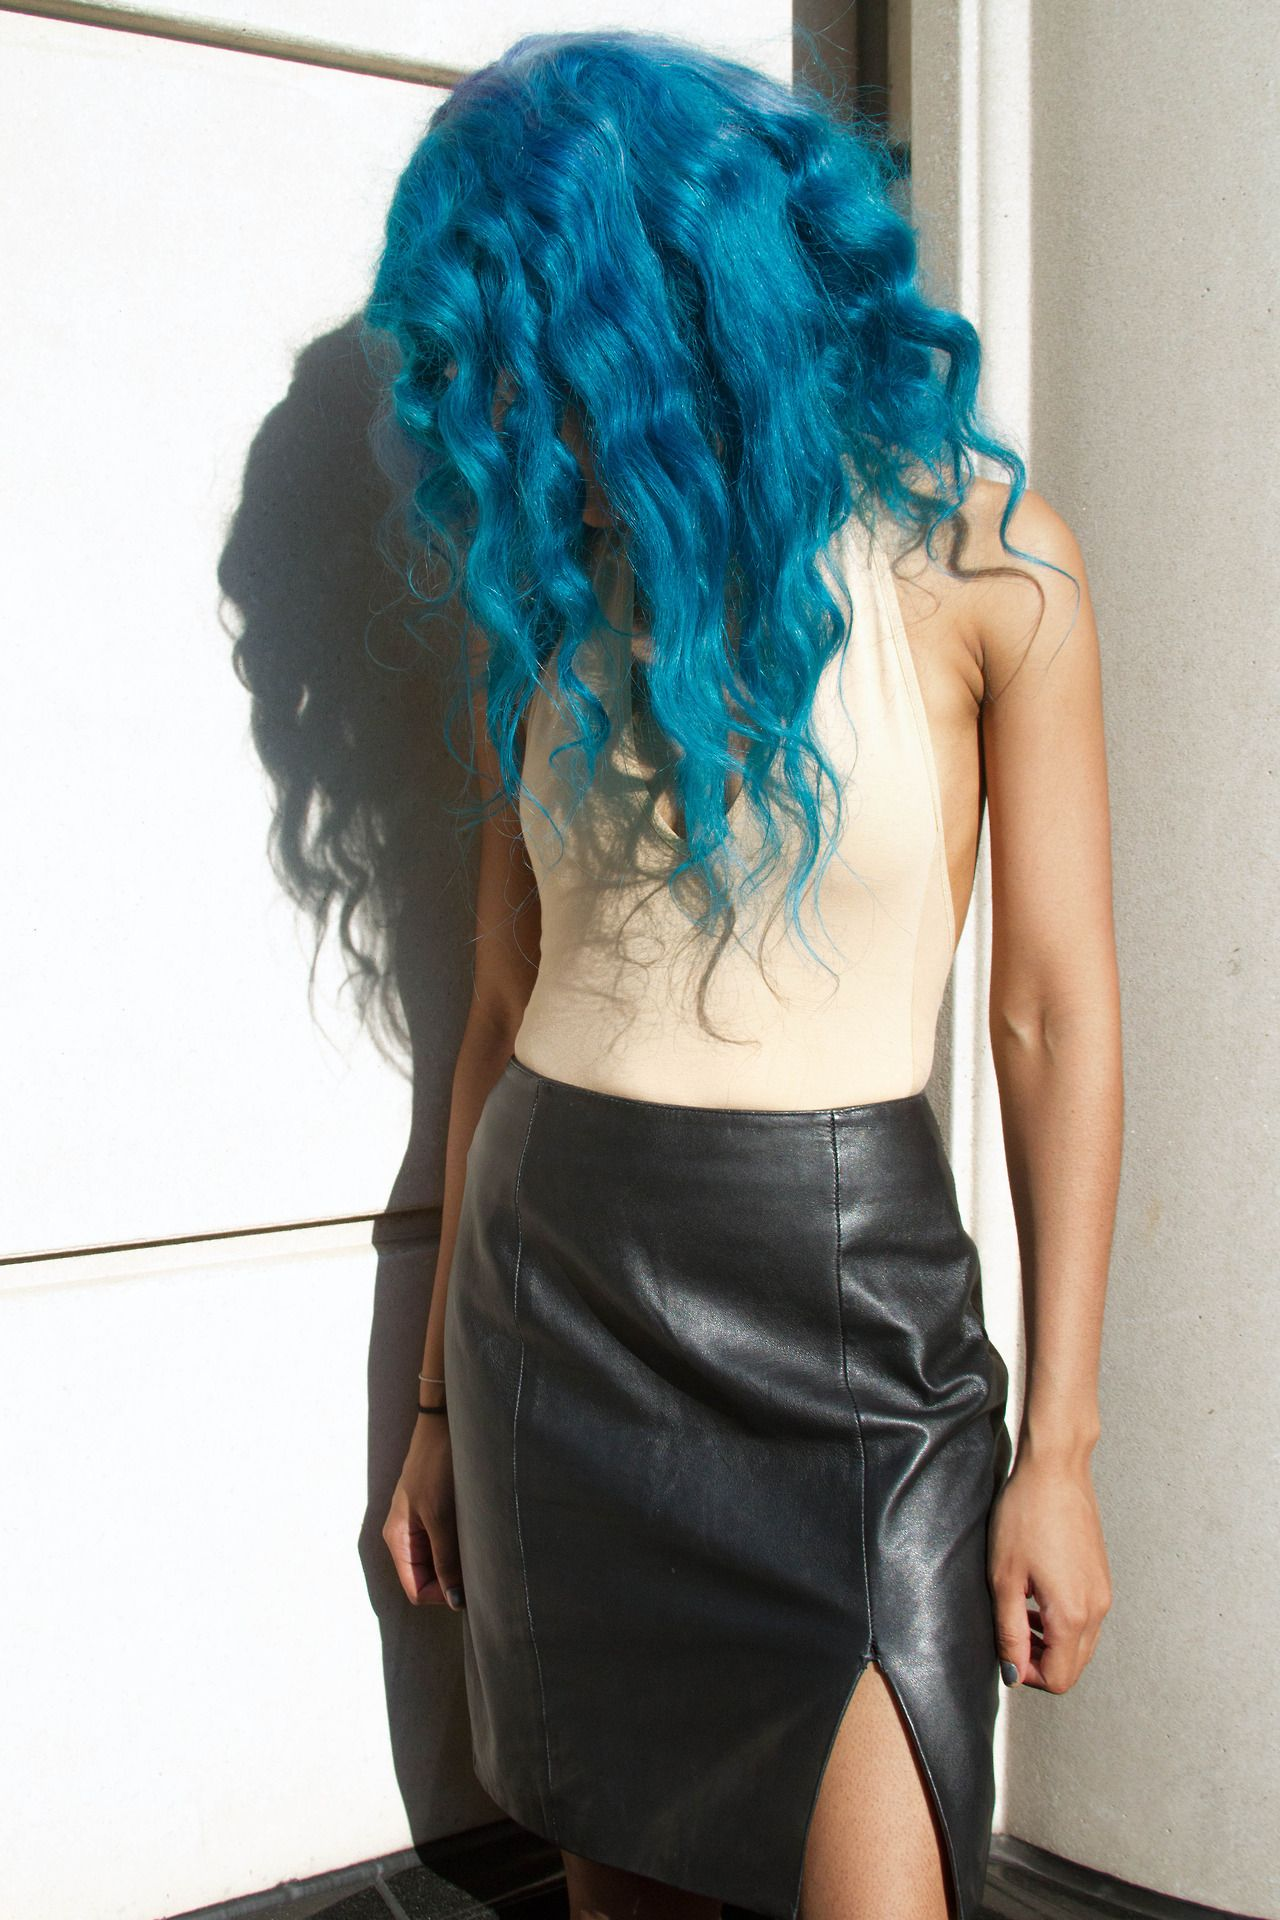 Pin by brandy lang on inne pinterest hair coloring blue hair